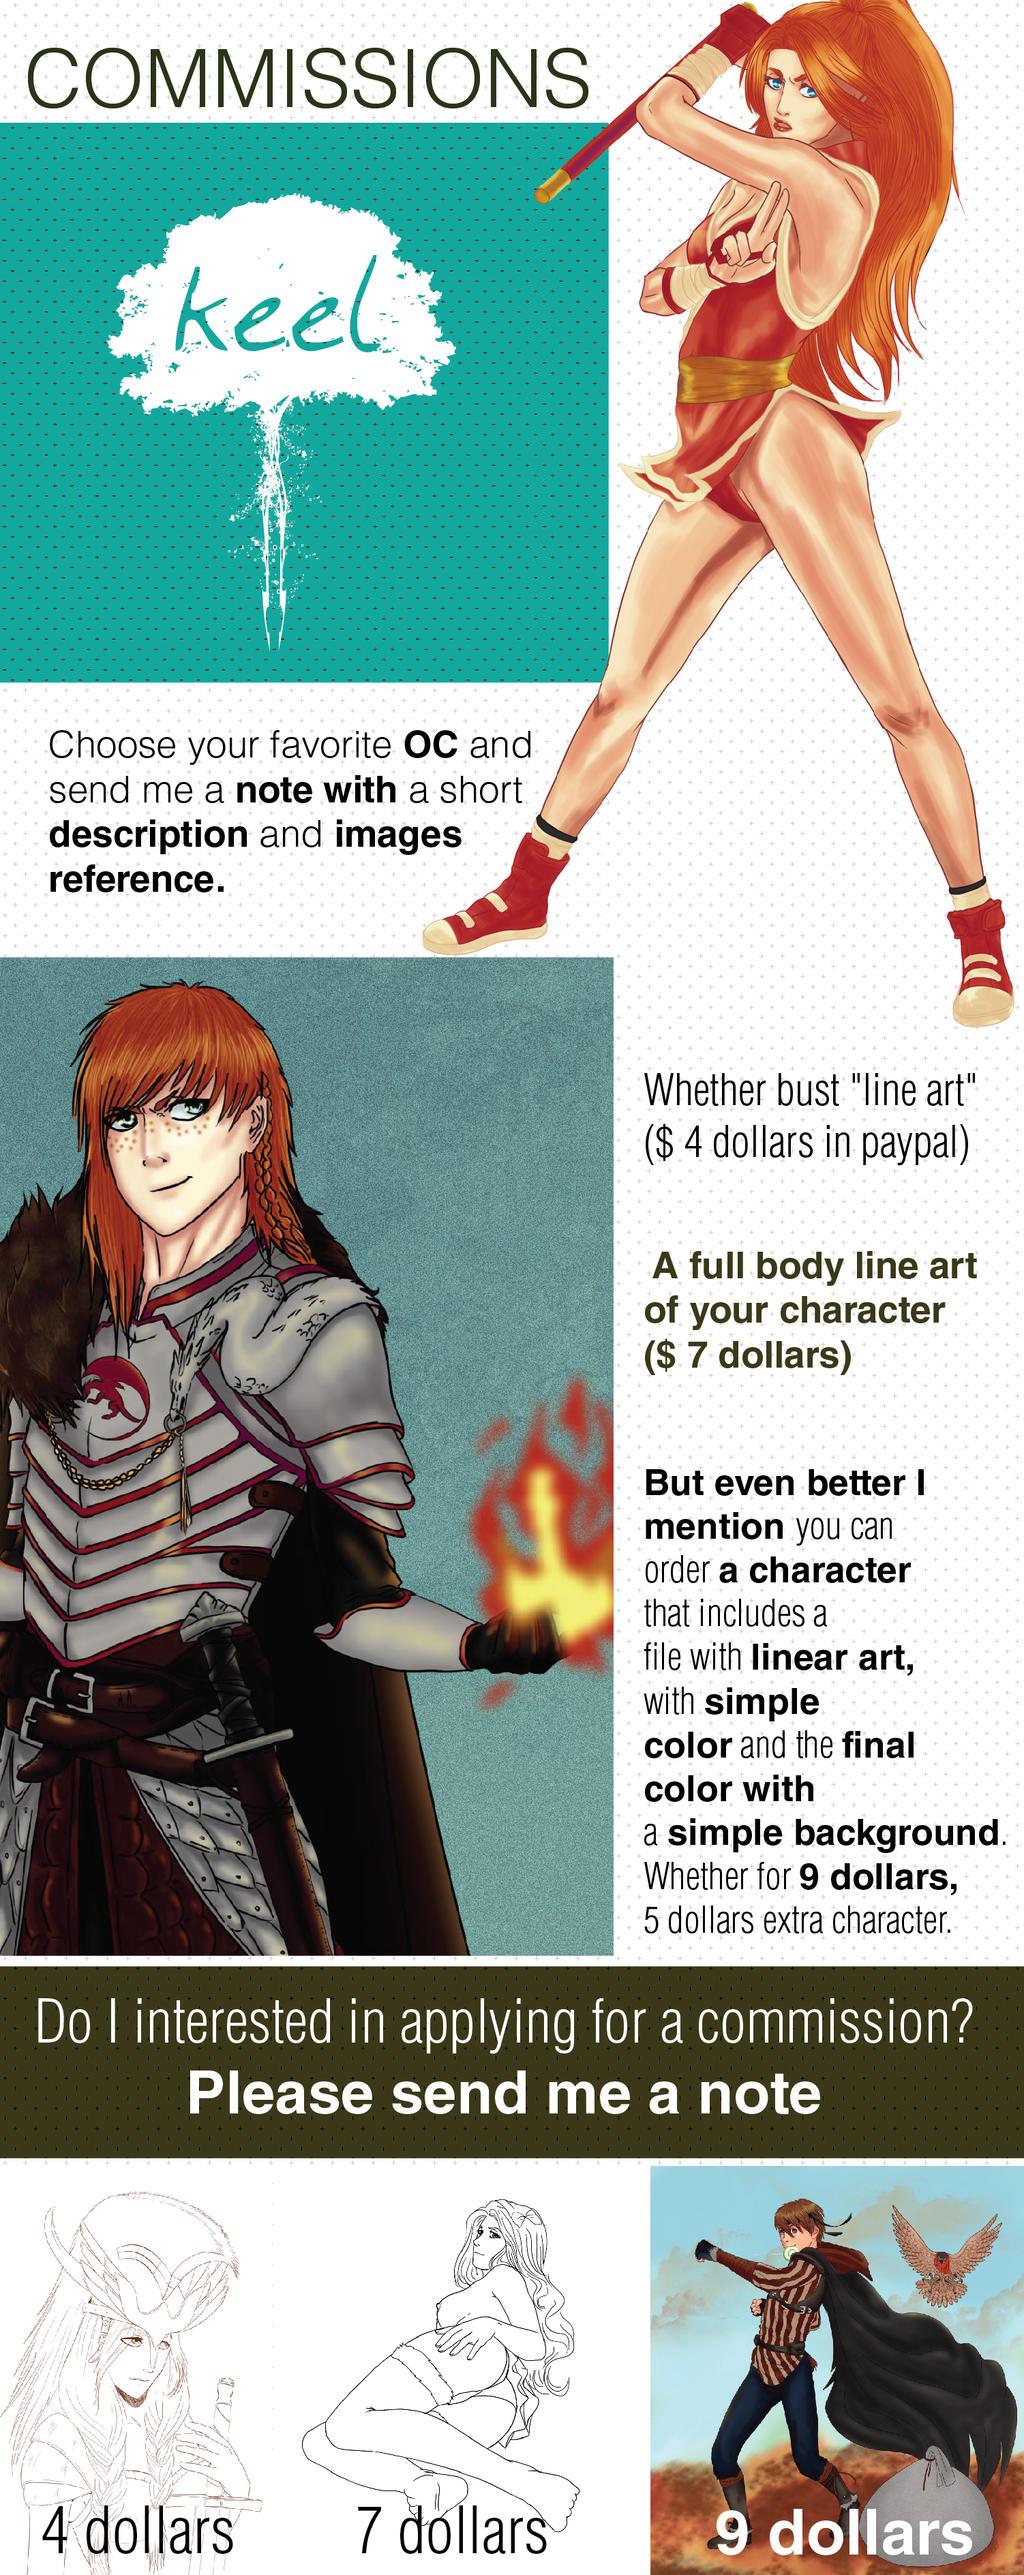 KeelTierraYerma's Profile Picture